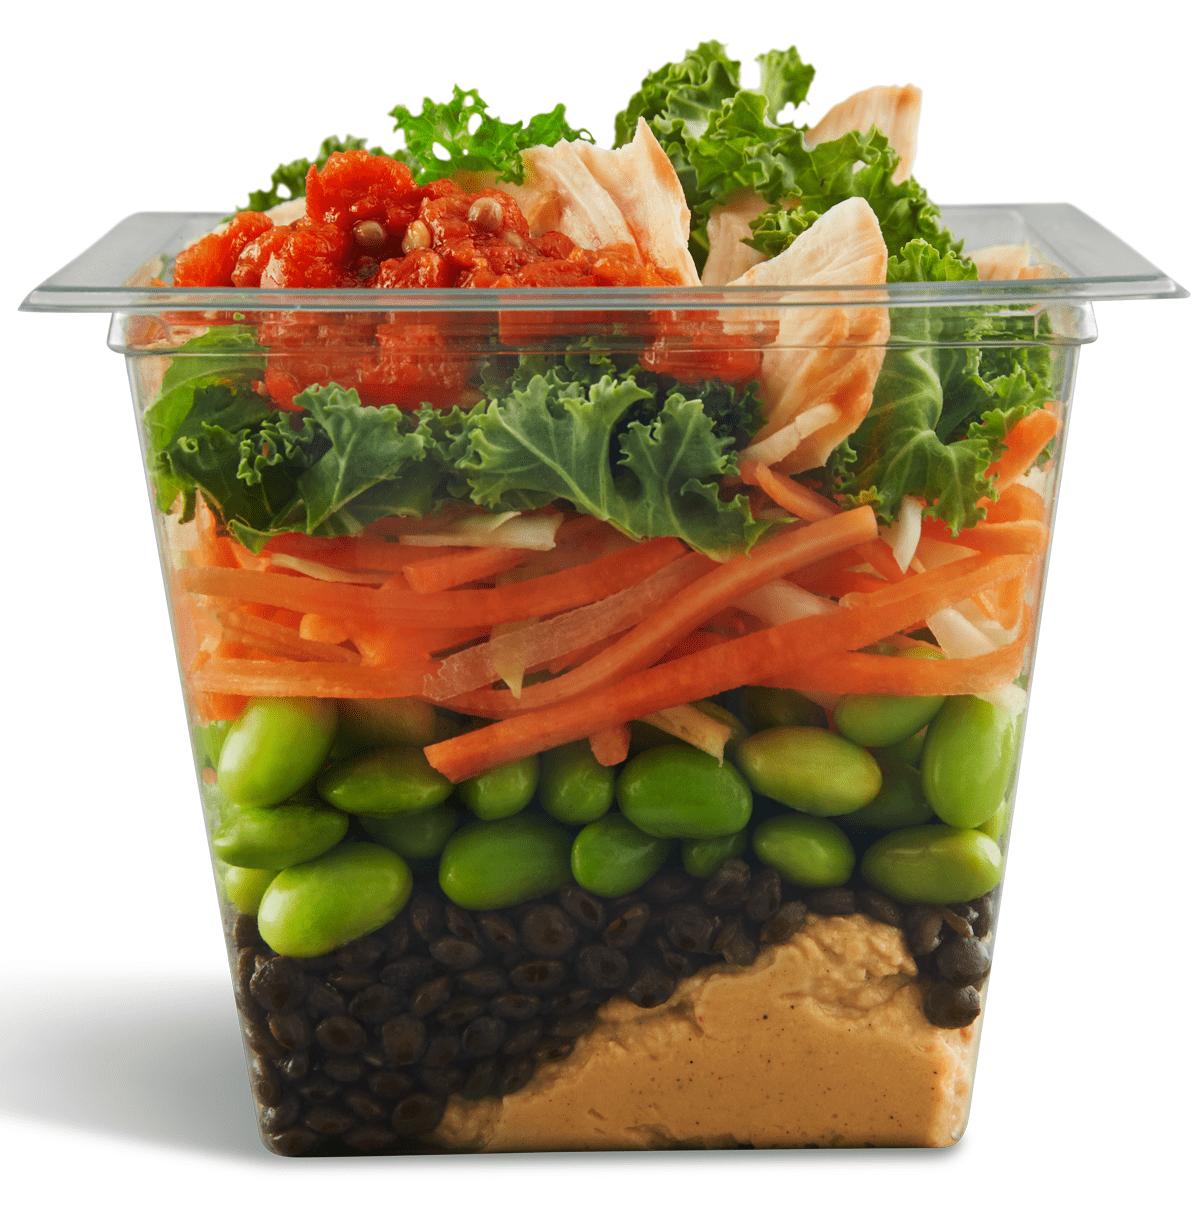 McDonald's hummus salad